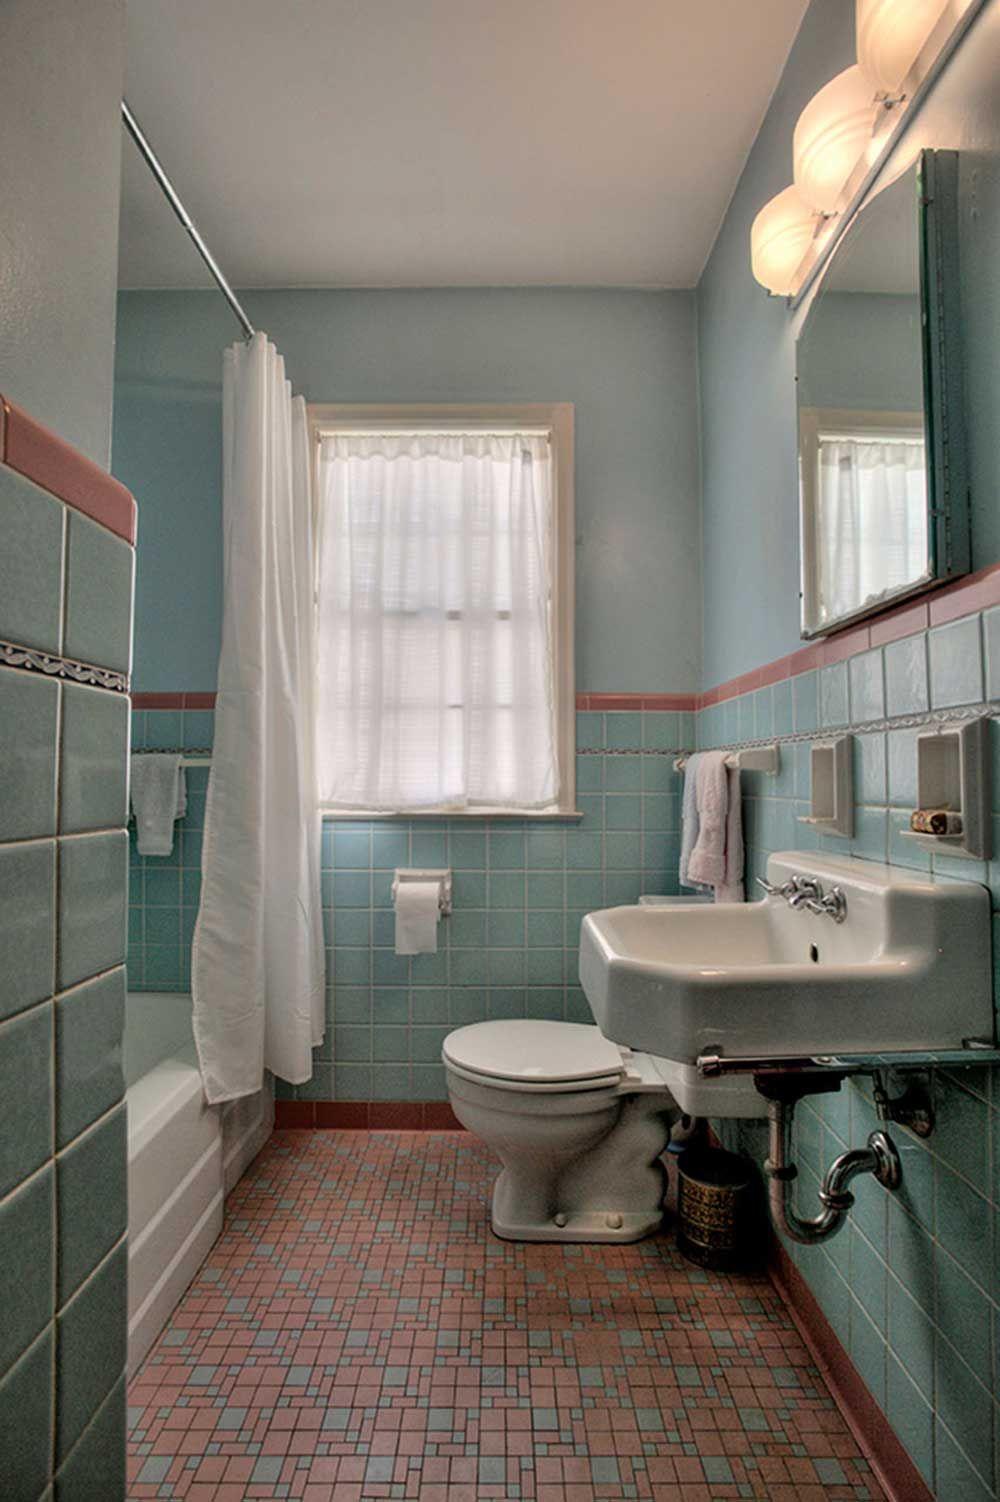 1949 time capsule house filled with original charm - Badkamer, Wc en ...